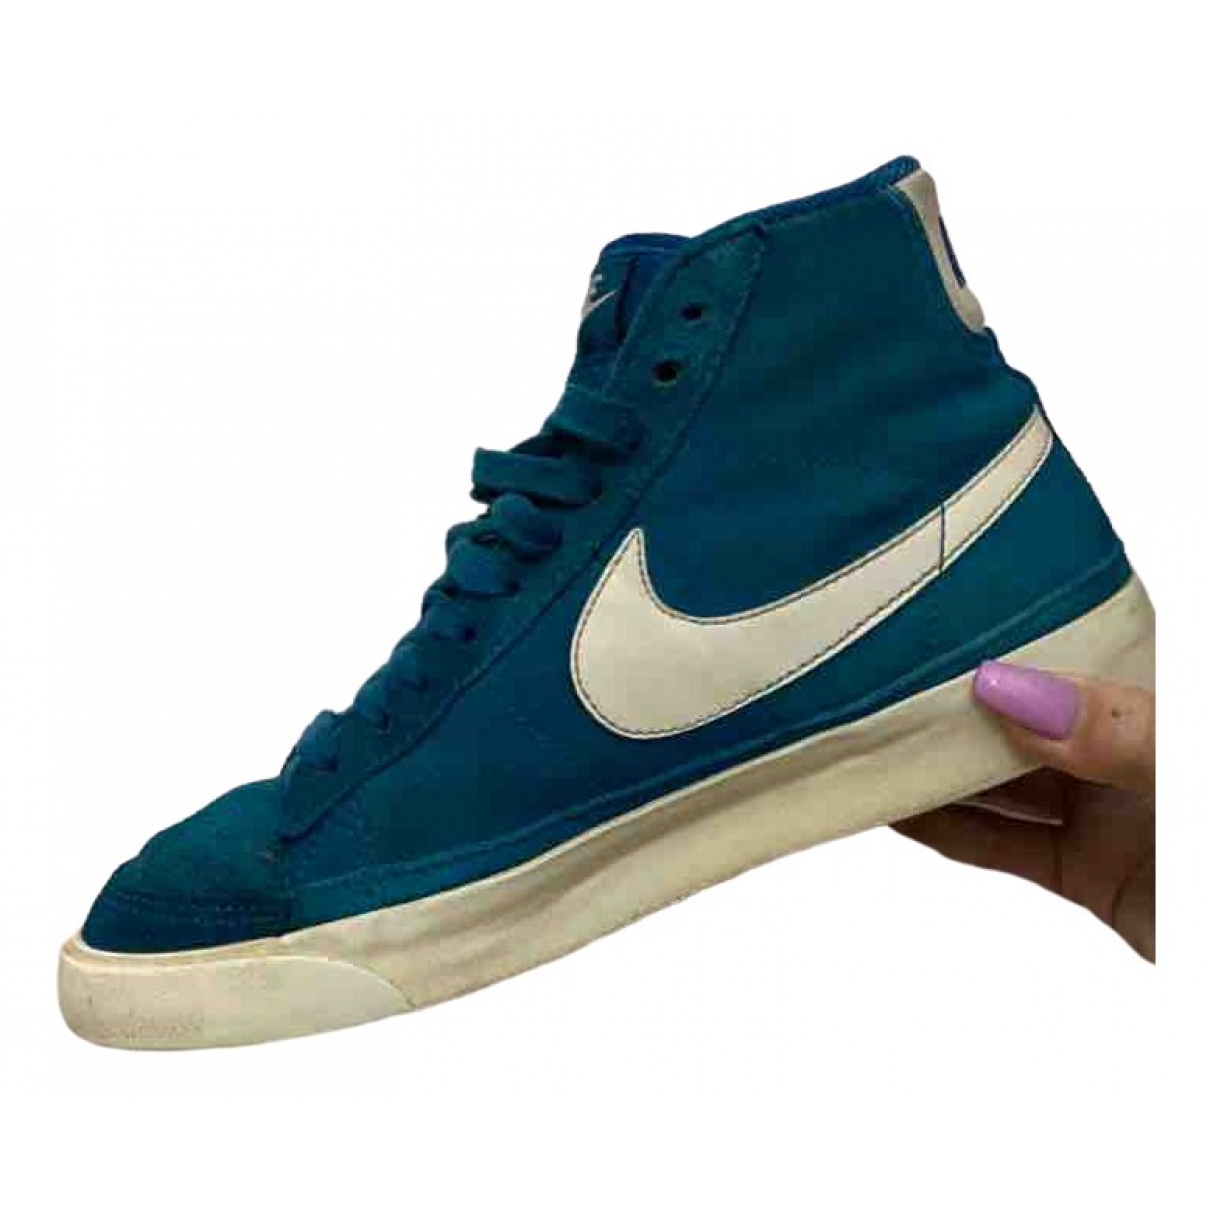 Nike Blazer Turquoise Cloth Trainers for Women 38 EU